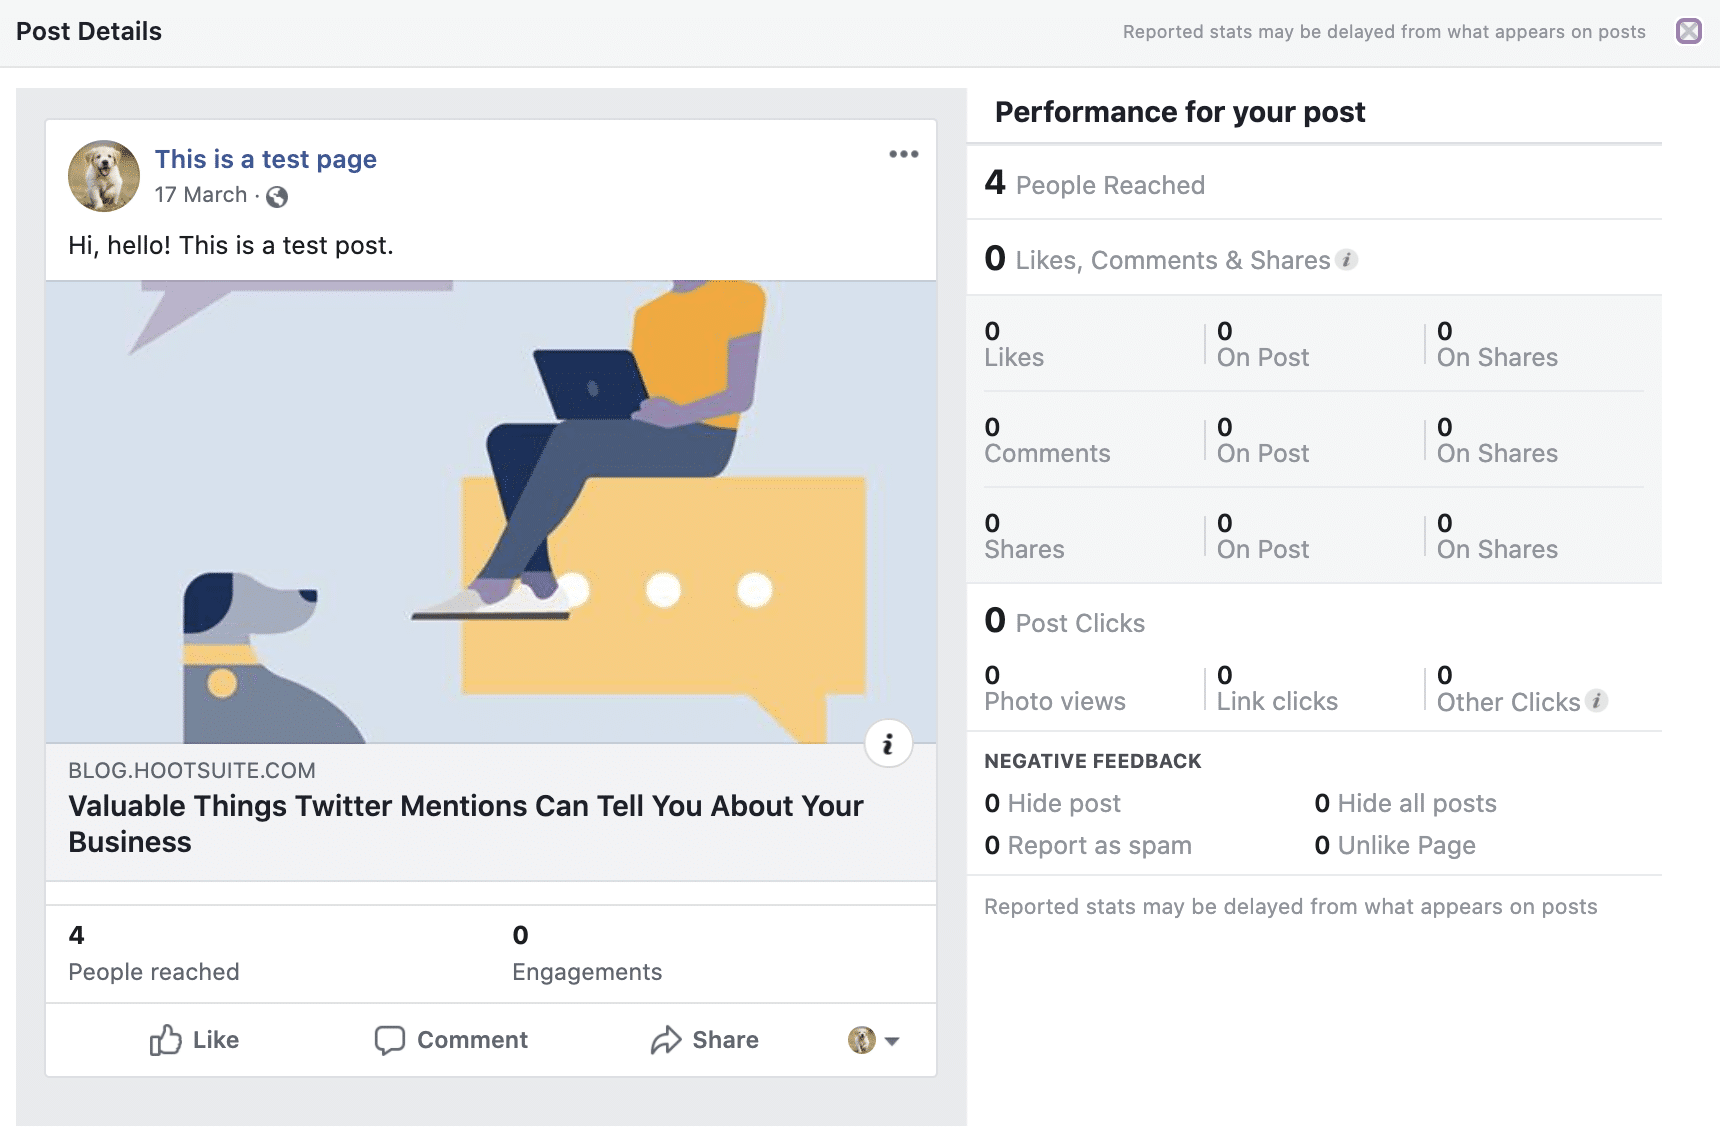 post details performance